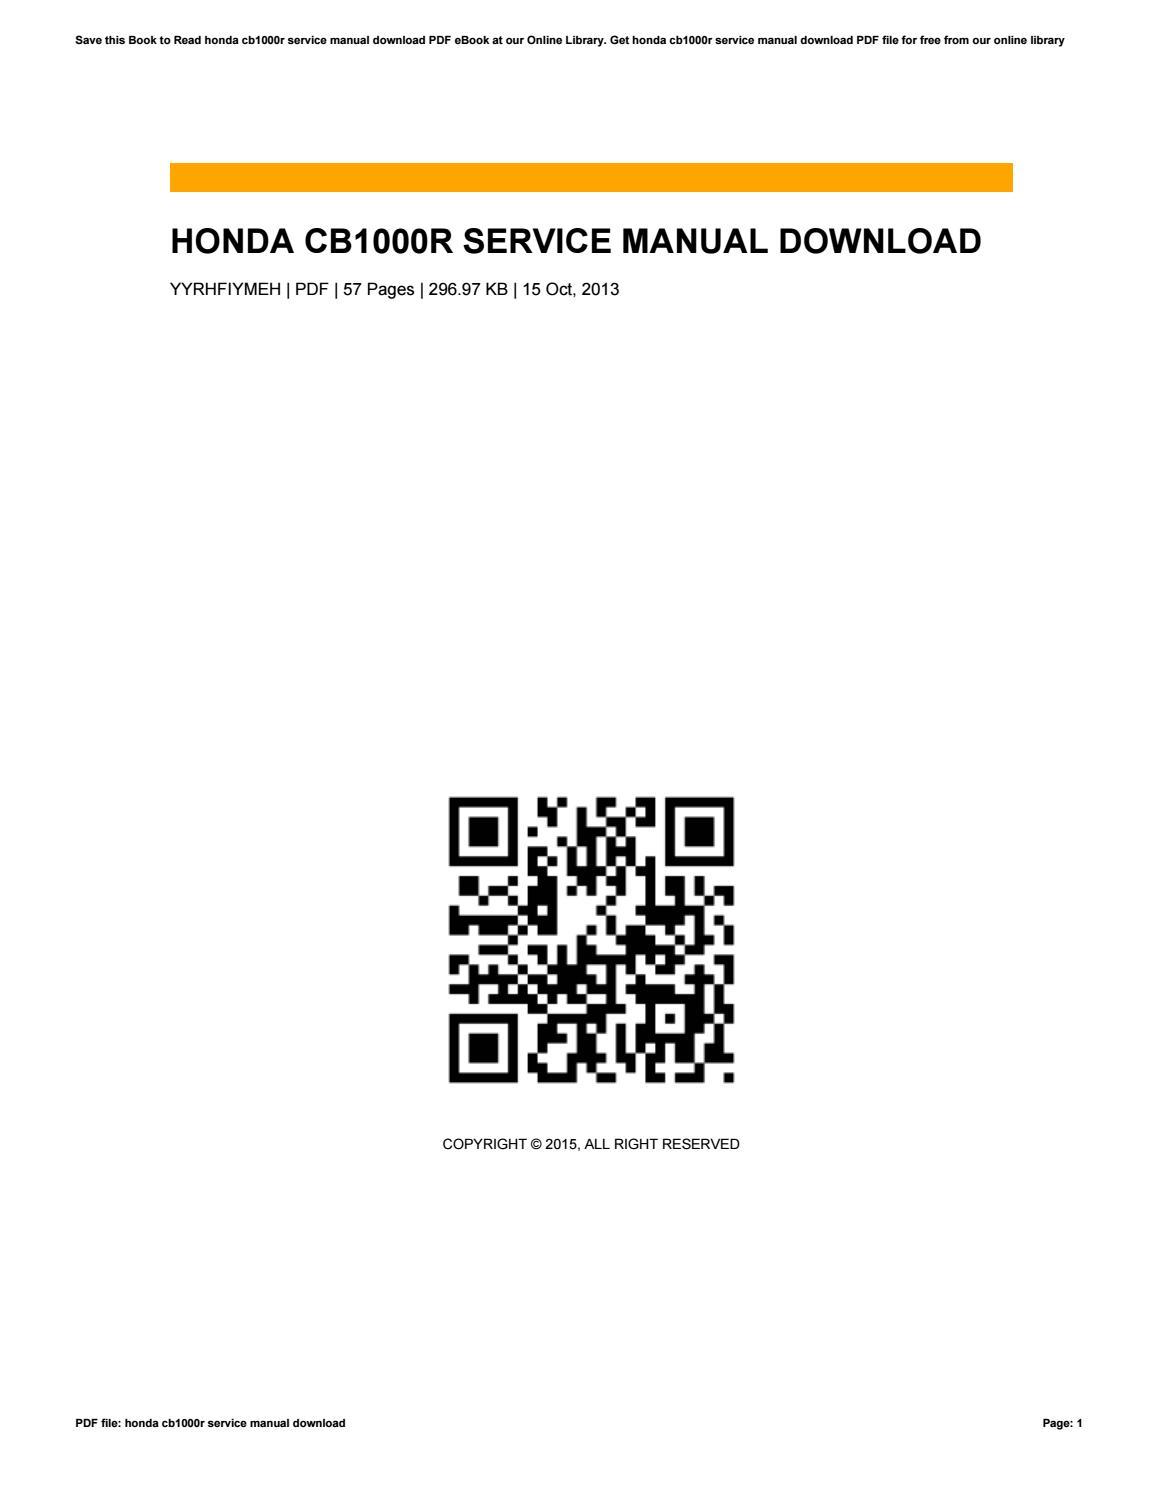 honda cb1000r service manual download by peggylett1964 issuu rh issuu com honda cbr1000rr service manual honda cbr1000rr service manual